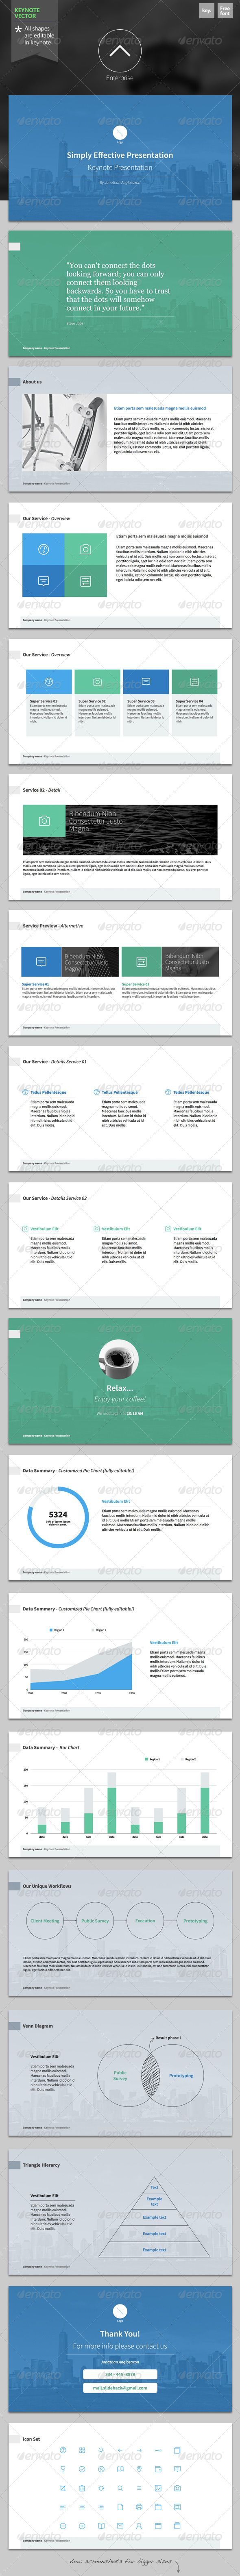 Presentation Templates - Enterprise - Keynote Template | GraphicRiver, presentation, design,